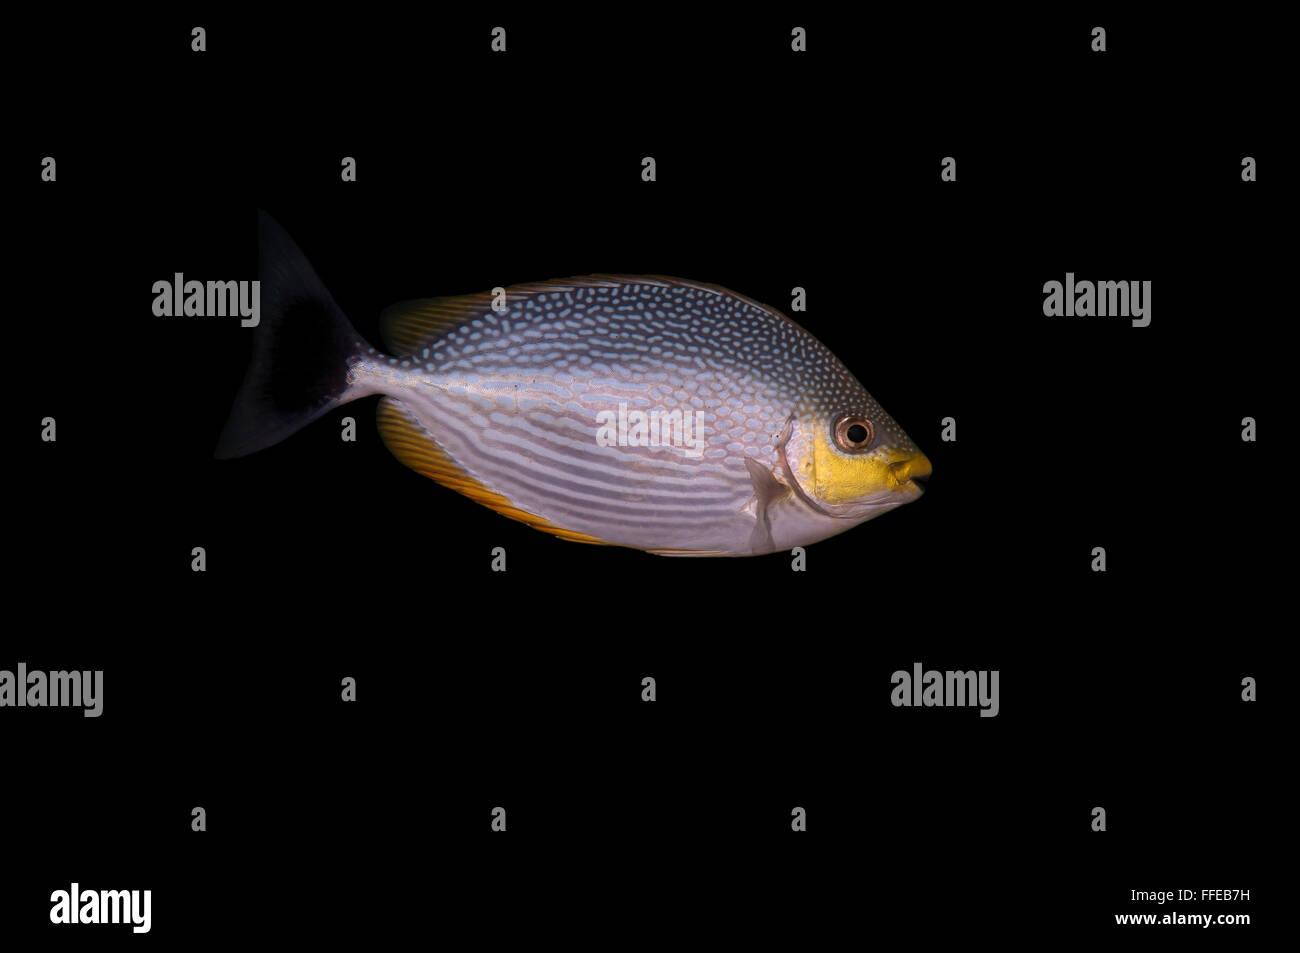 Spinefoot spinefoot rayas, rayas o Java Siganus javus rabbitfish (Océano Índico), Hikkaduwa, Sri Lanka, Imagen De Stock